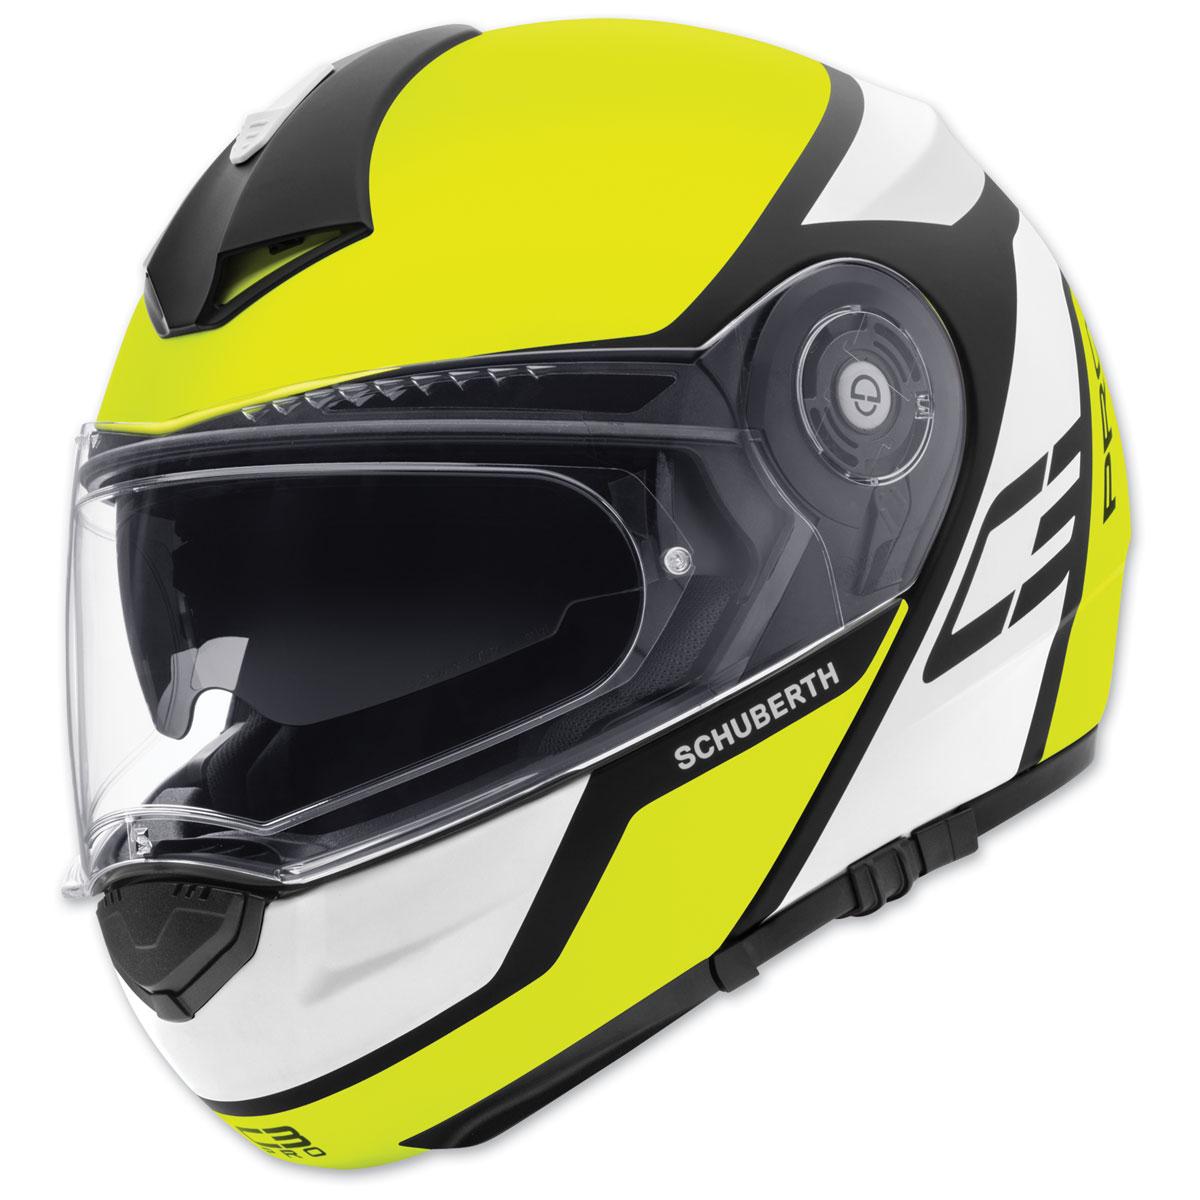 Schuberth C3 Pro Echo Yellow Modular Helmet